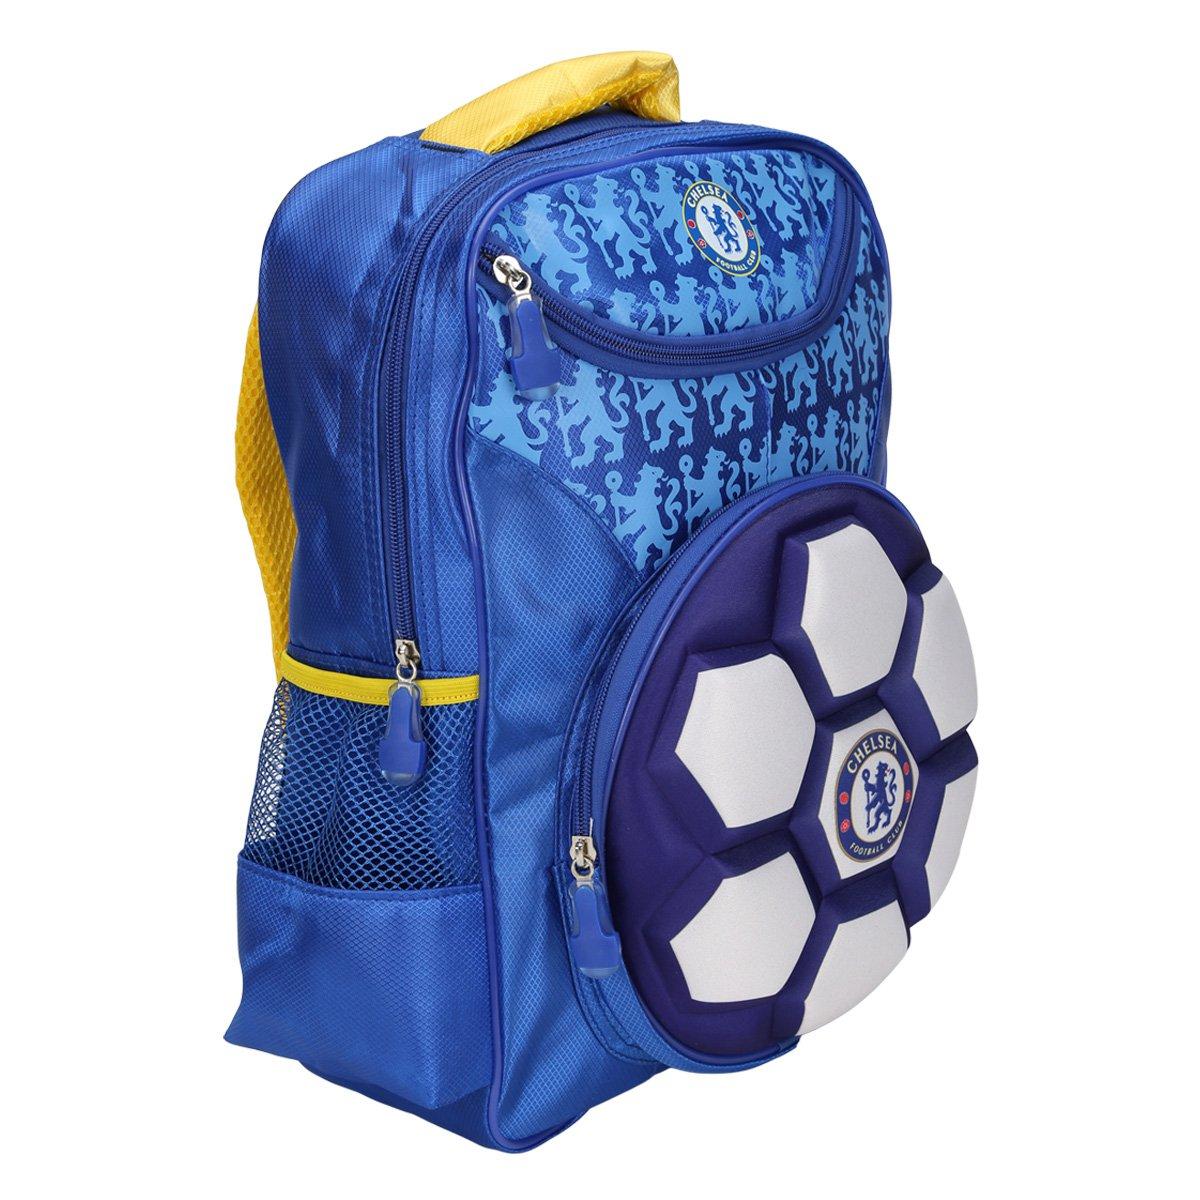 8bc479192c Mochila Chelsea Intantil Bola 3D - Compre Agora